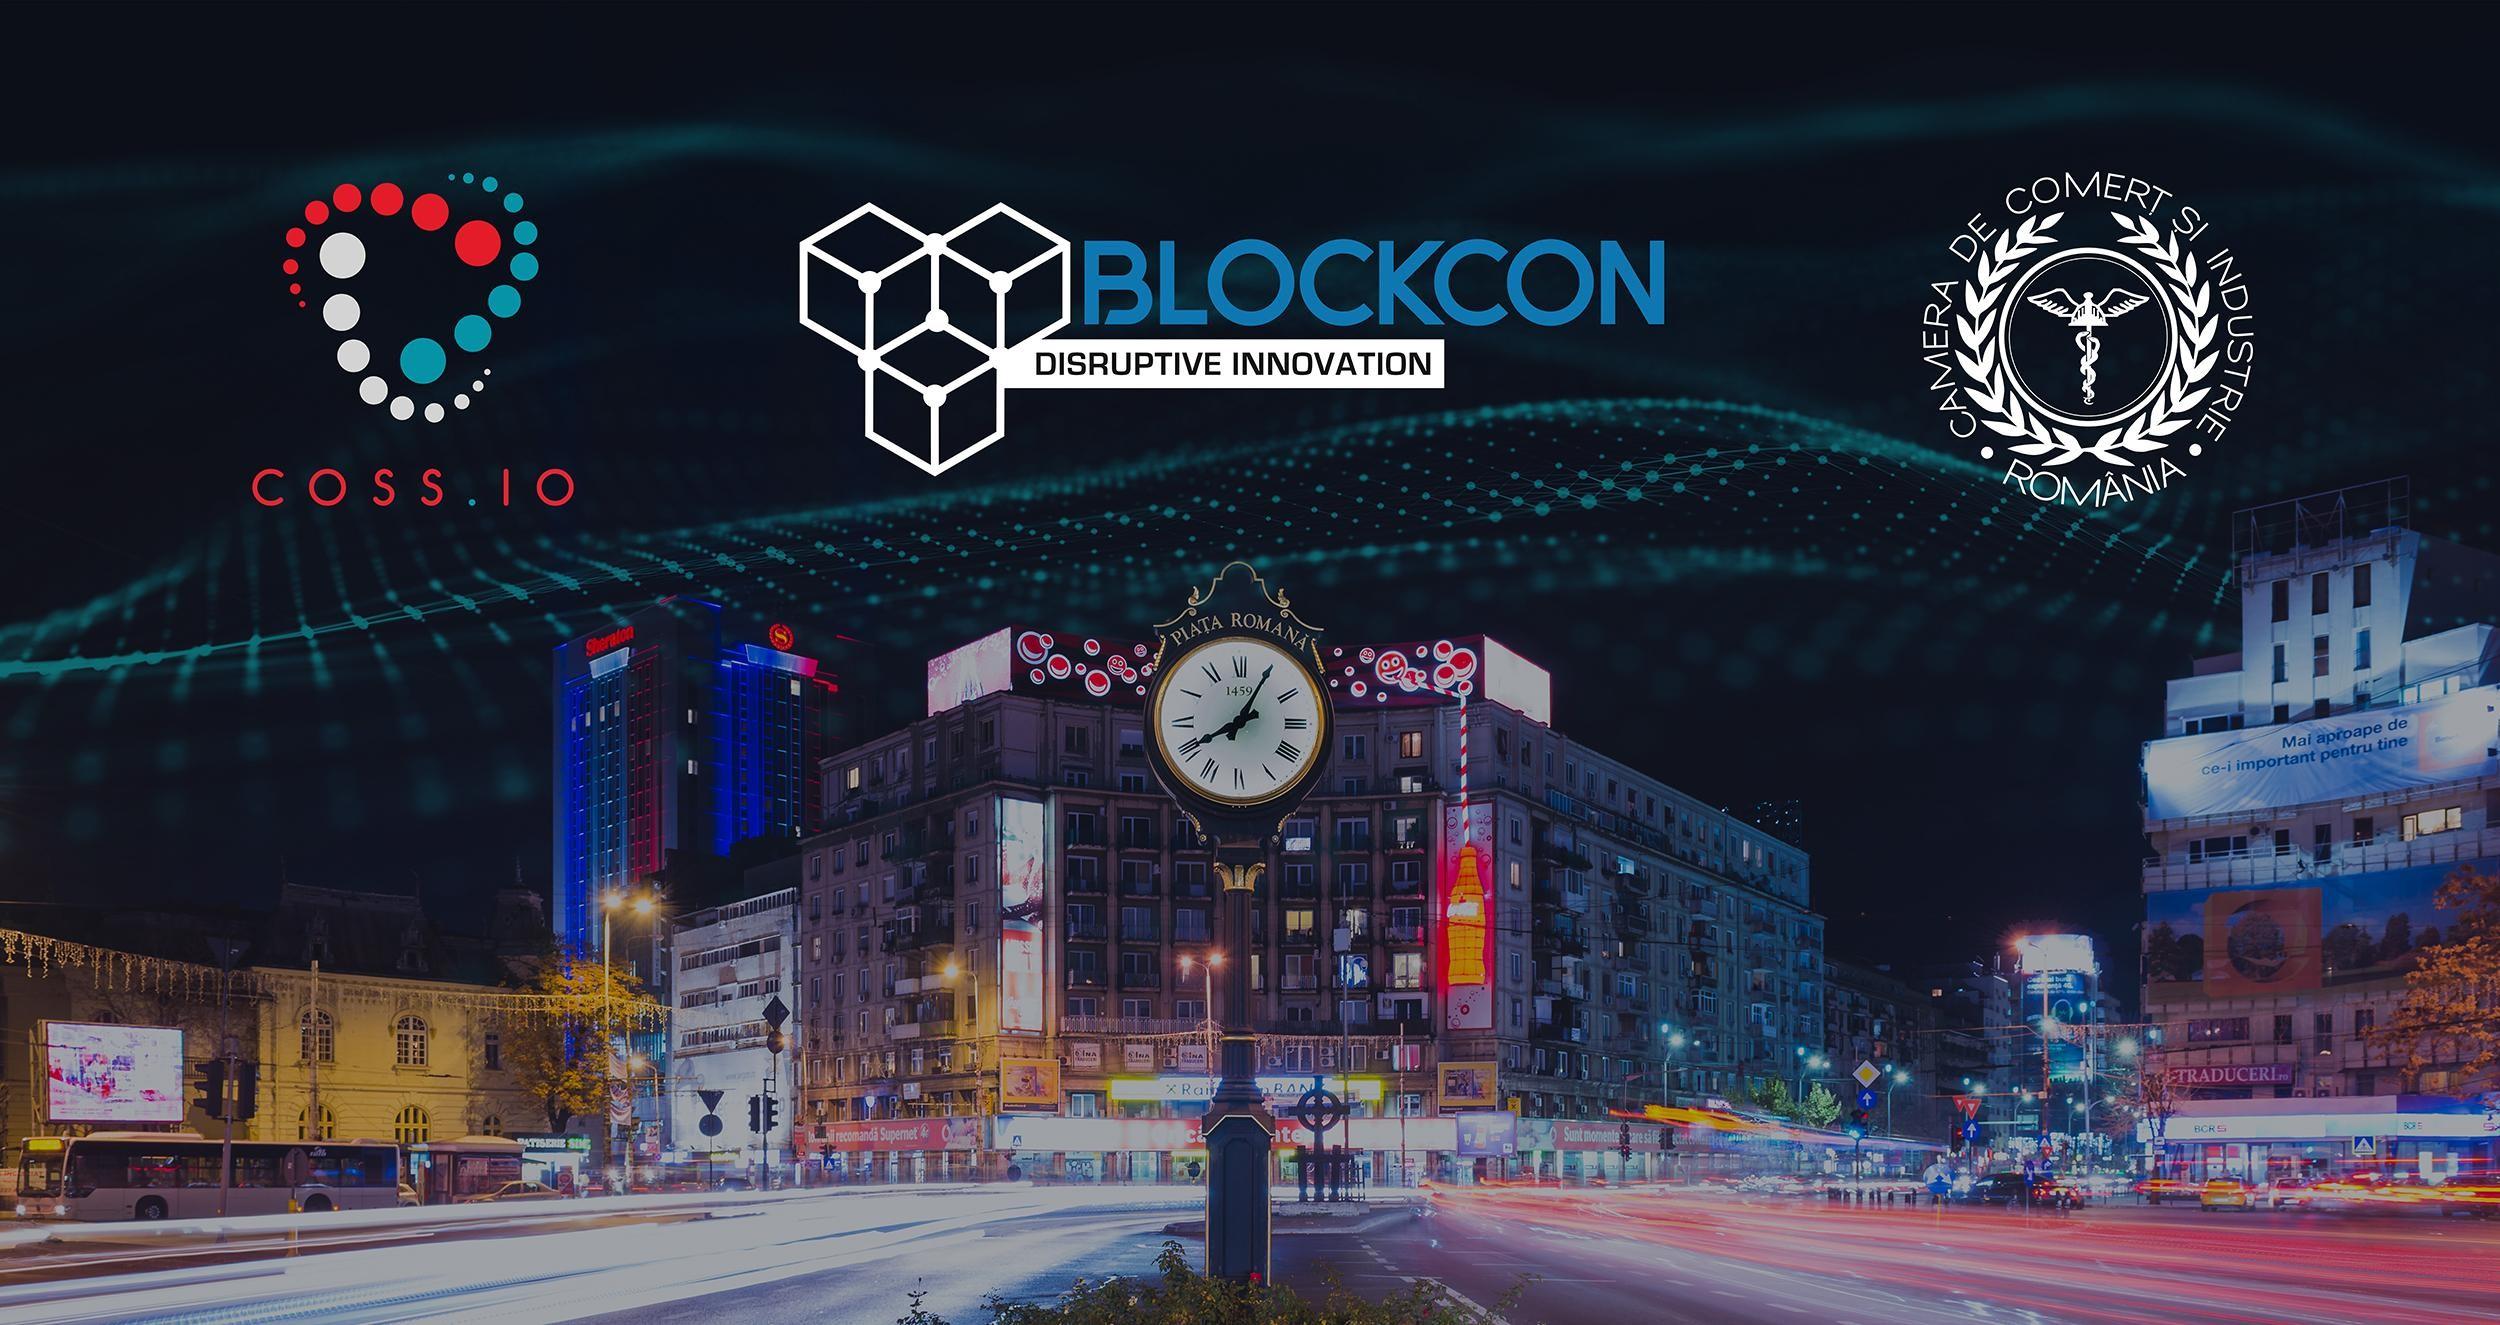 Bucharest, Romania: BlockCon - Disruptive Innovation Conference Resume